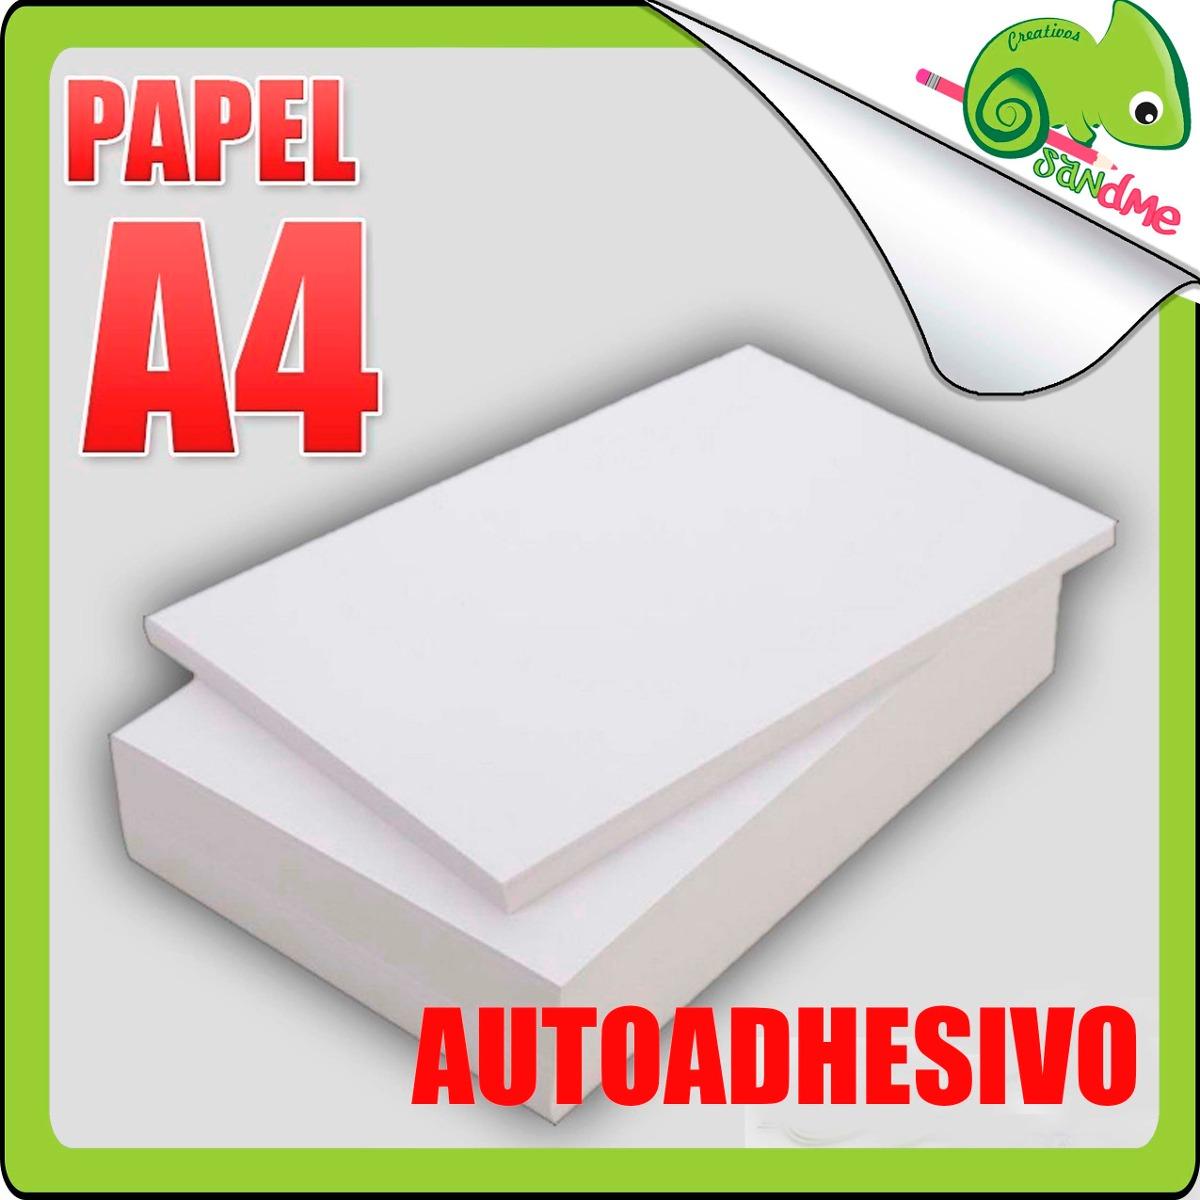 Papel autoadhesivo hoja para impresoras blanco a4 adhesivo s 65 00 en mercado libre - Papel pared autoadhesivo ...